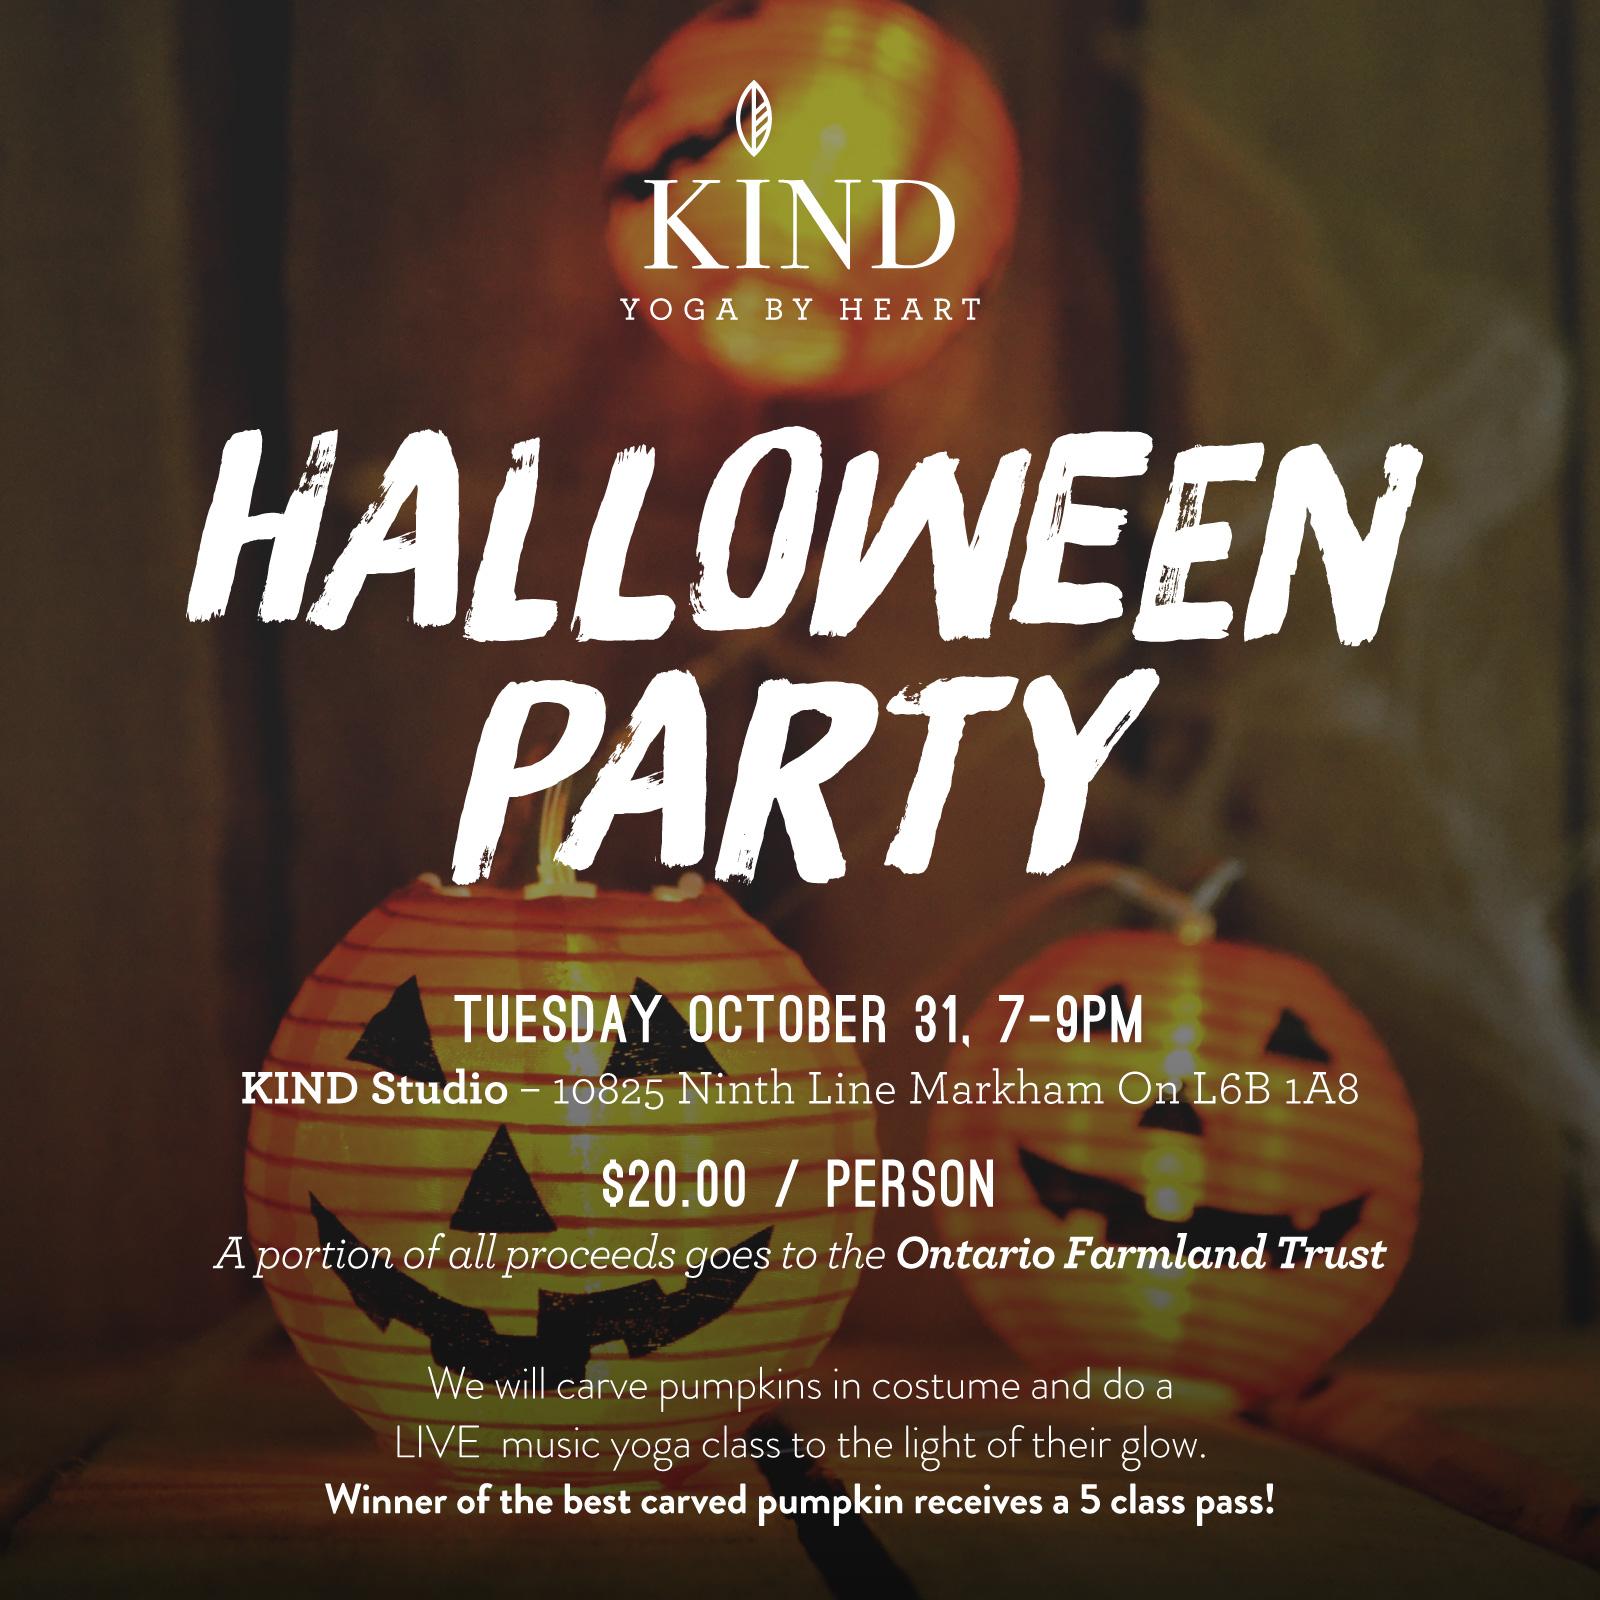 KindYoga-HalloweenParty-v01.jpg